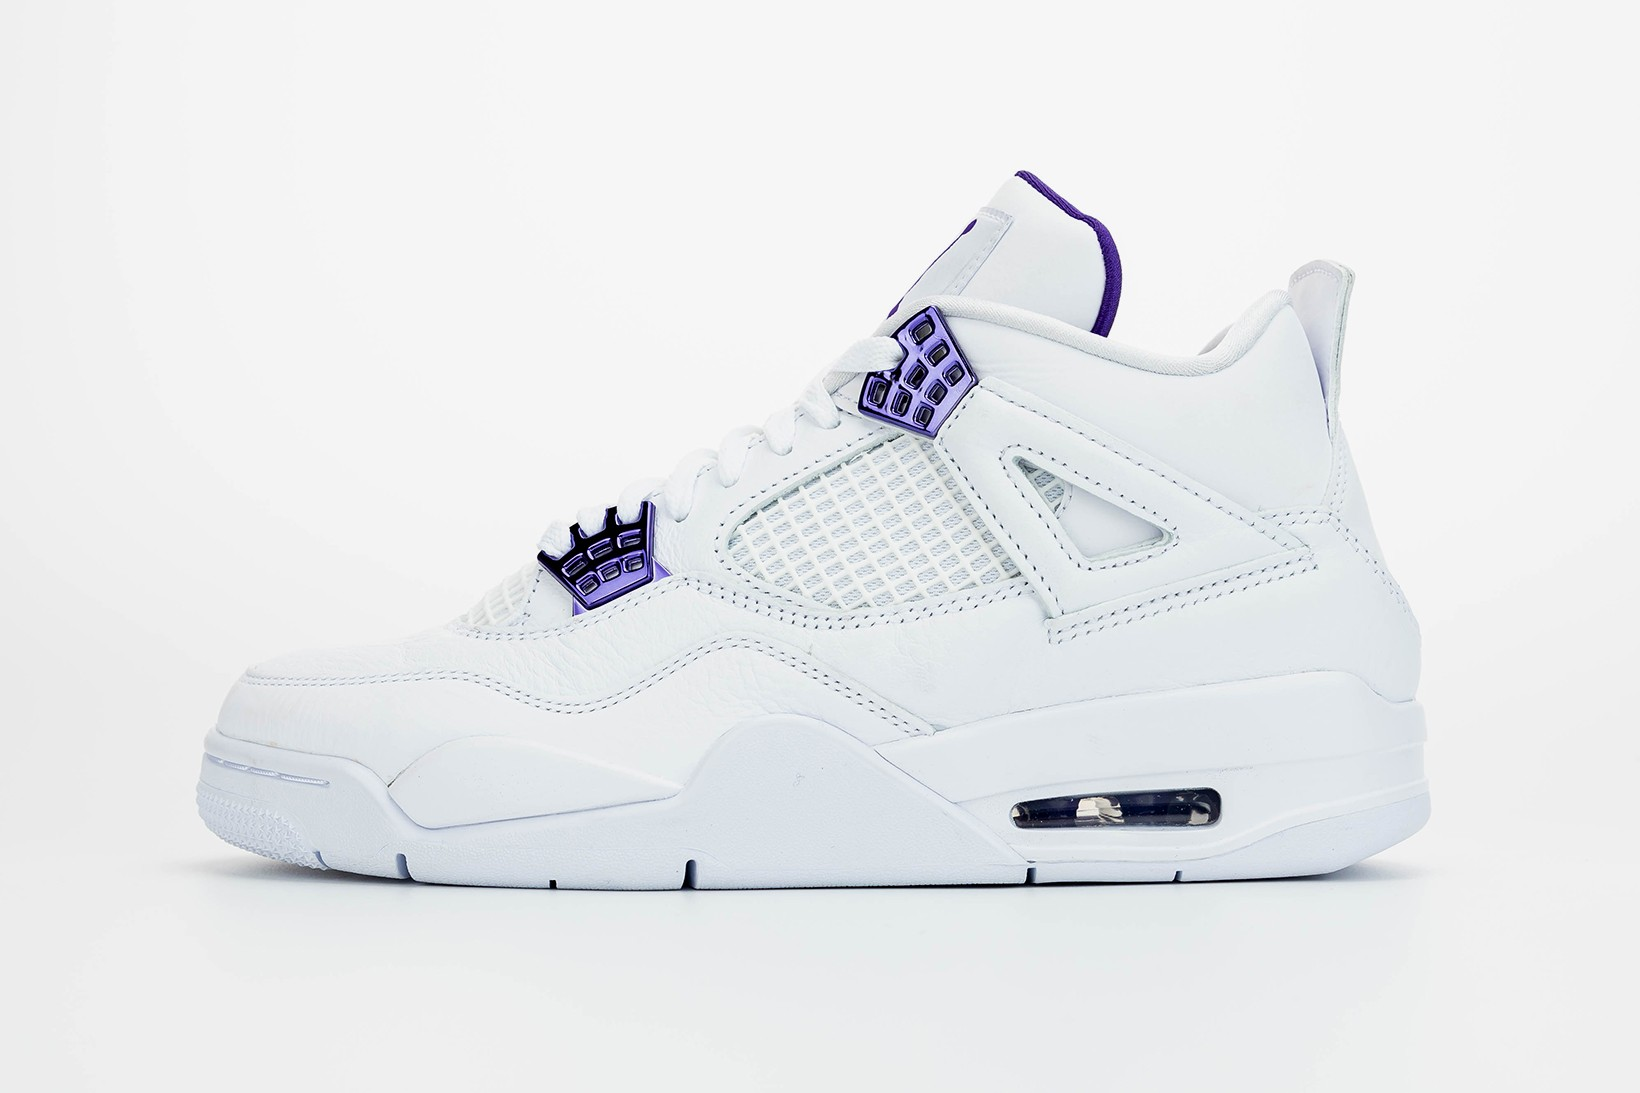 White/Purple Air Jordan 4 Release Date